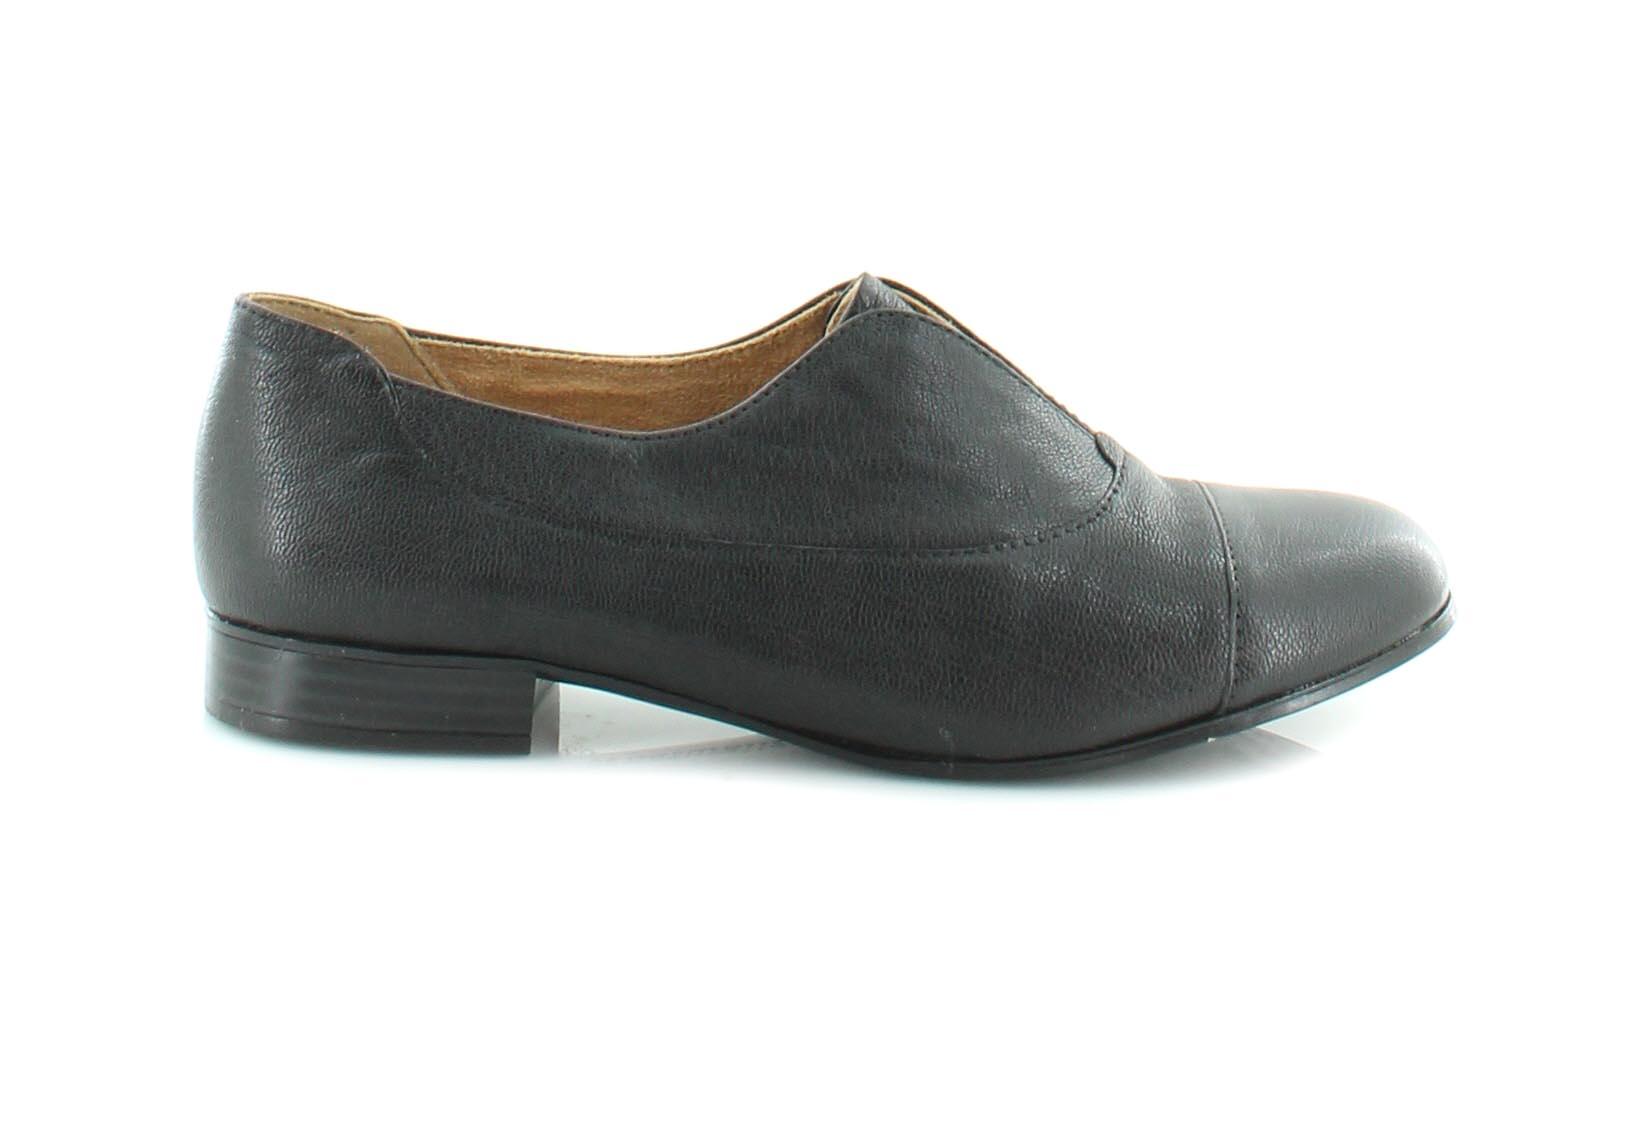 Naturalizer Carabell Women's Flats & Oxfords Black Size ...